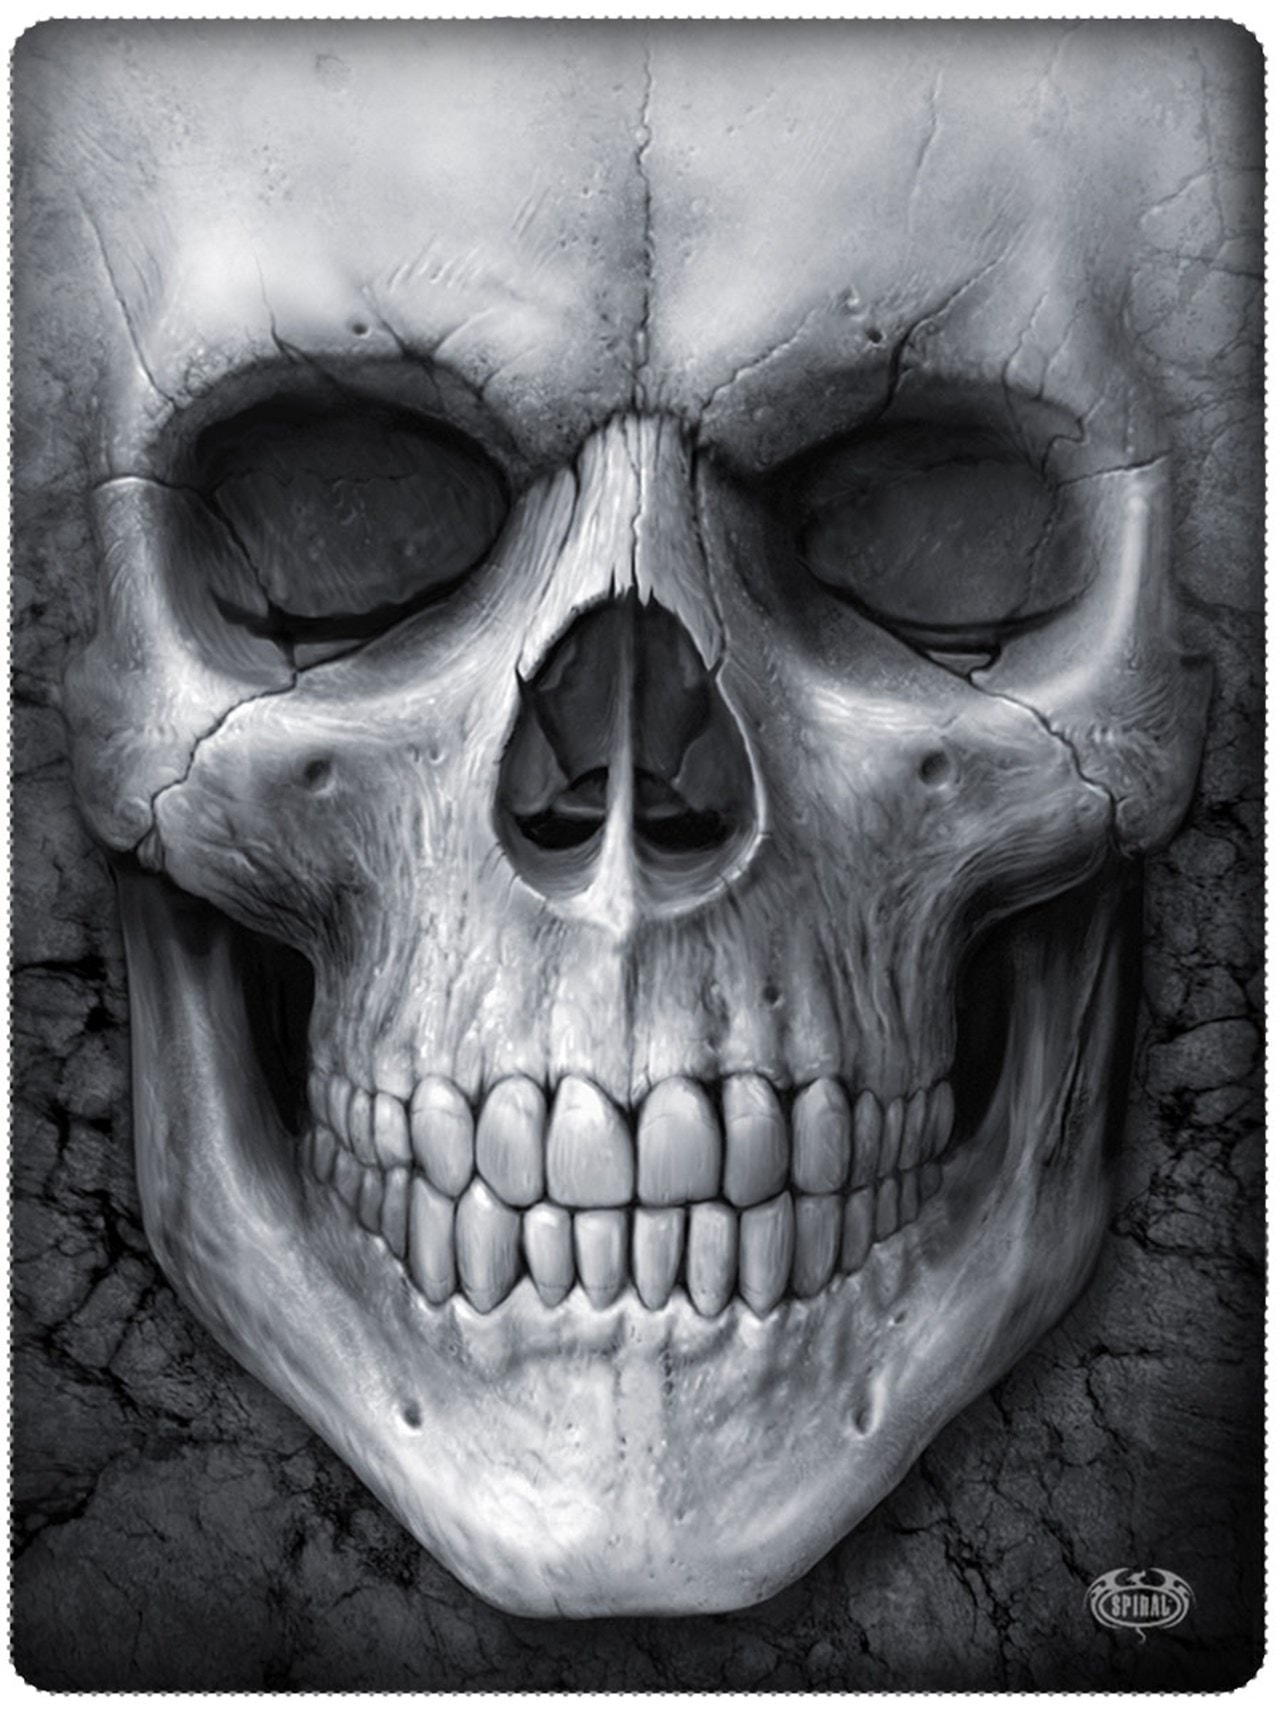 Solemn Skull Fleece Blanket - 2